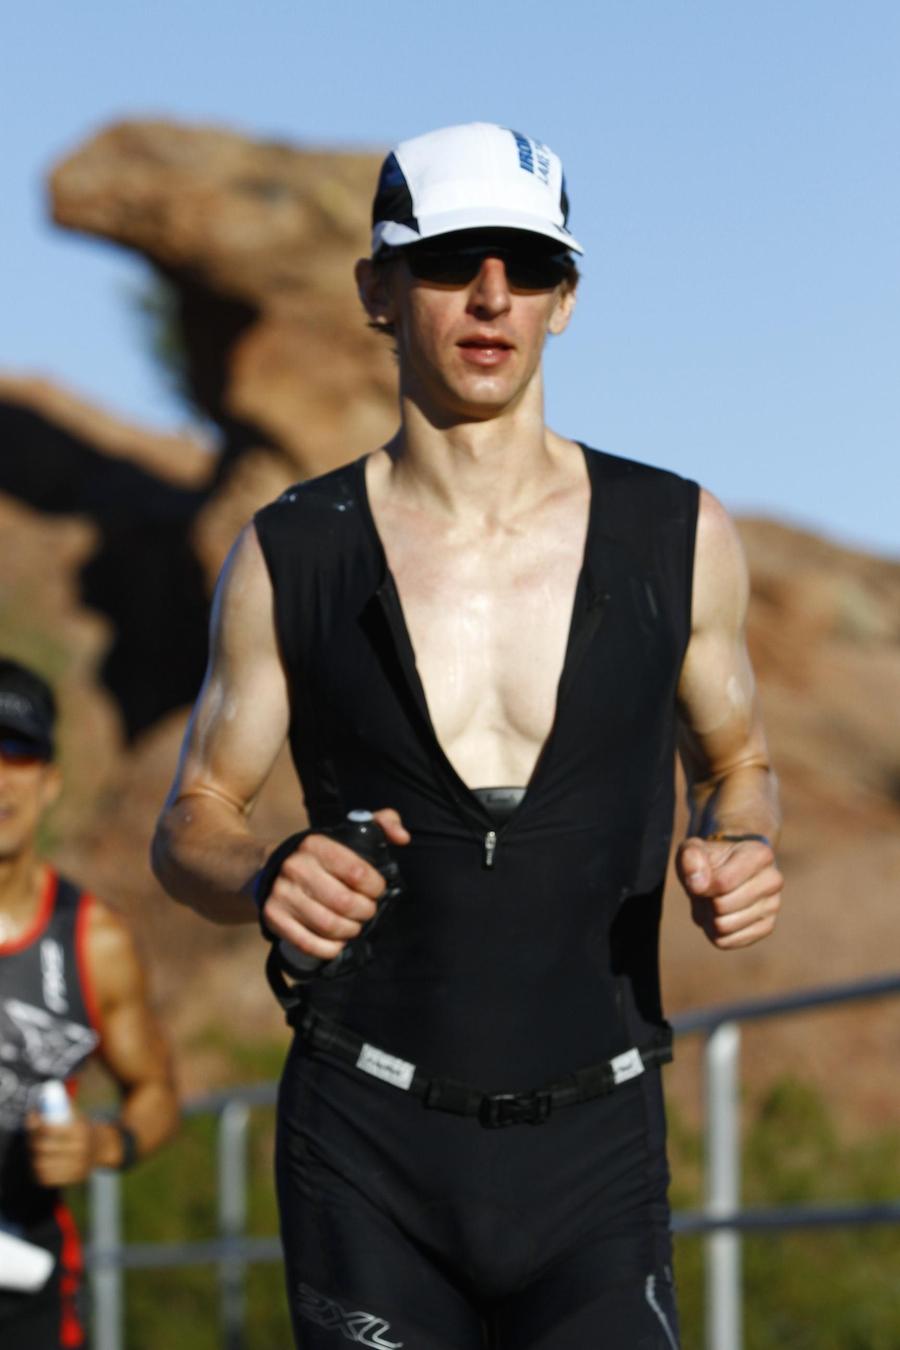 greg_kroleski_ironman_arizona_run_hill